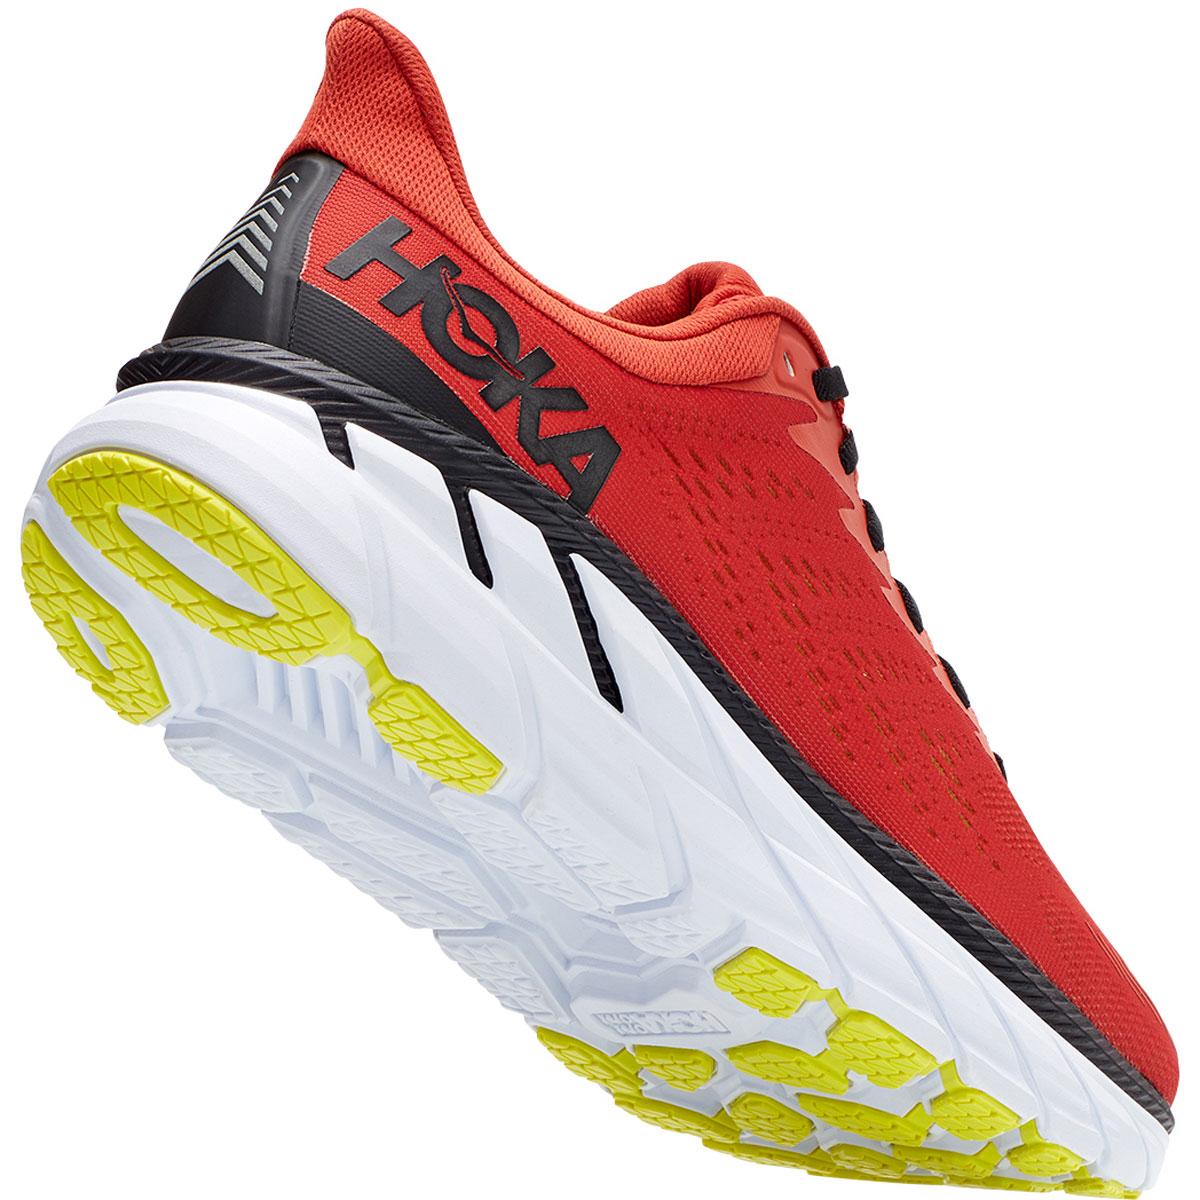 Men's Hoka One One Clifton 7 Running Shoe - Color: Chili/Black - Size: 9 - Width: Regular, Chili/Black, large, image 5